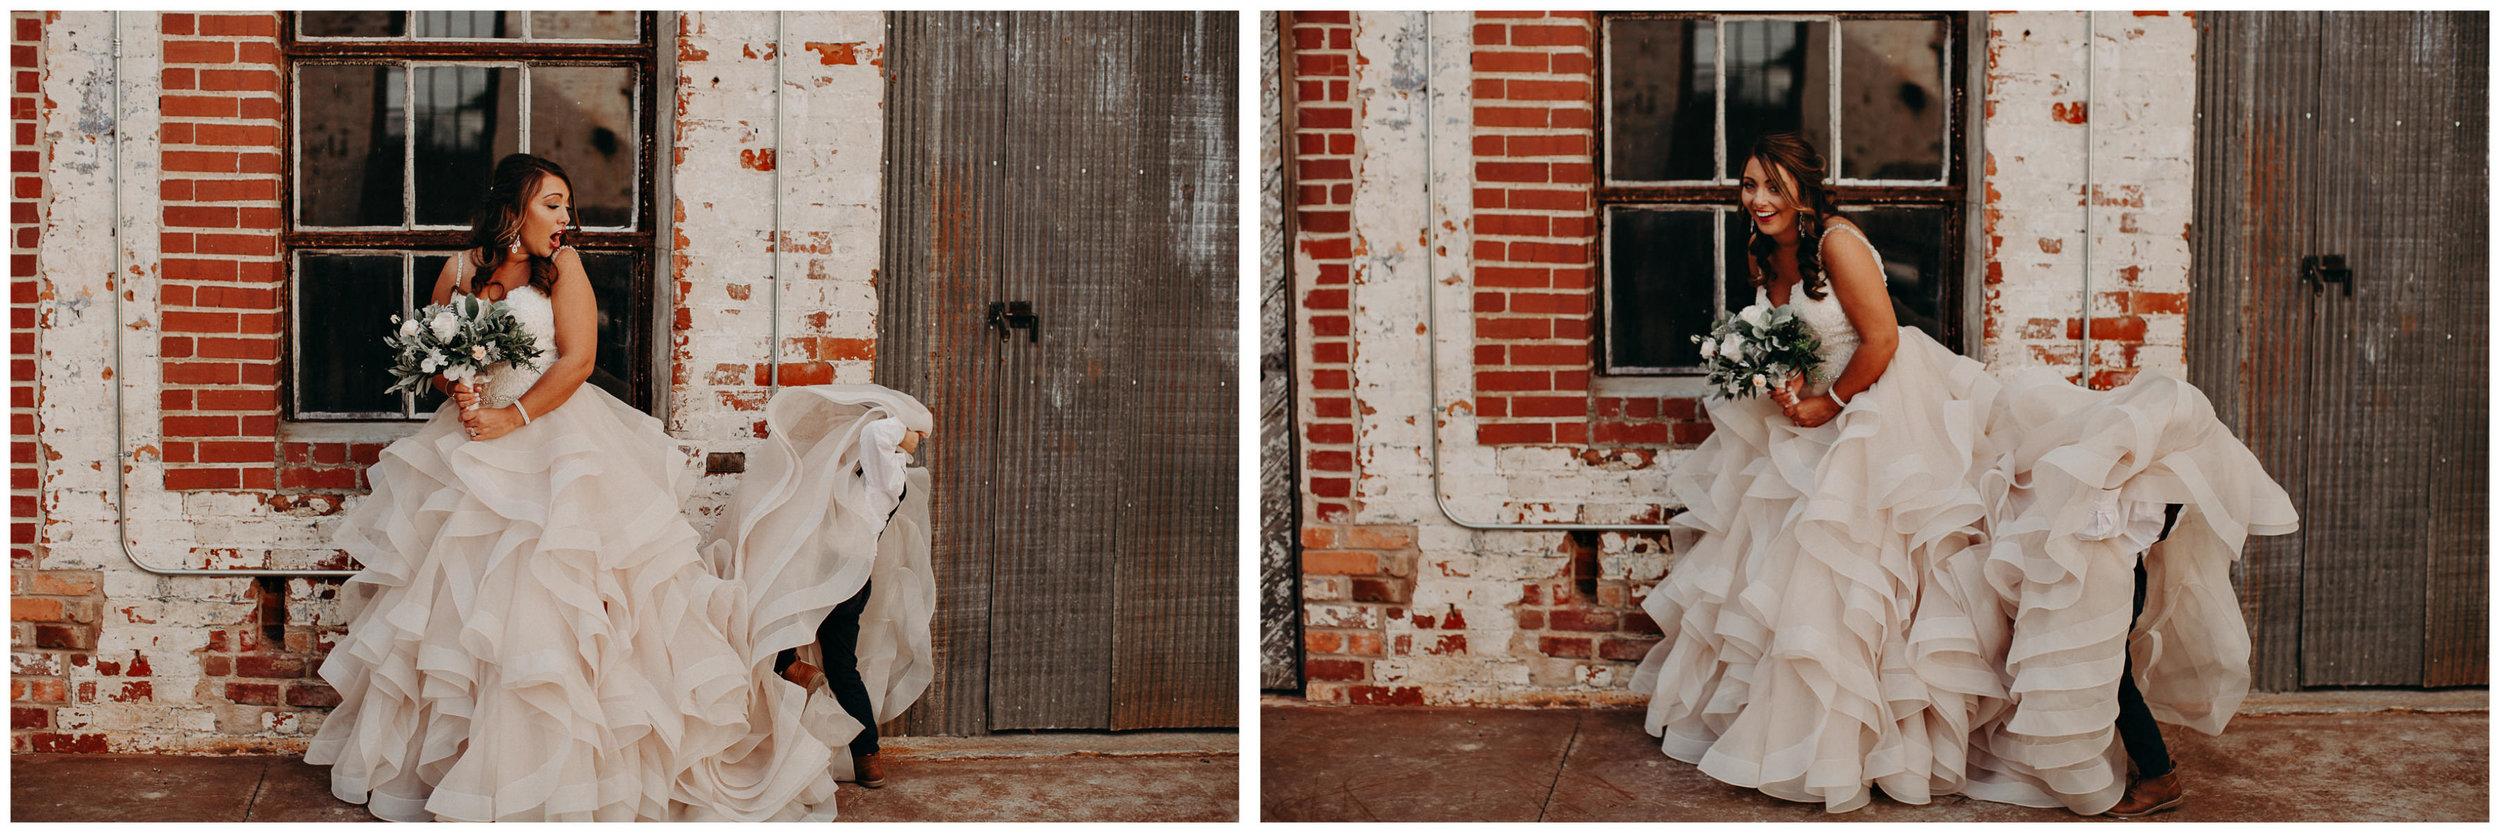 32 4 - Atlanta Wedding Photographer - The engine room - Ga - Wedding trends - Aline Marin Photography.jpg